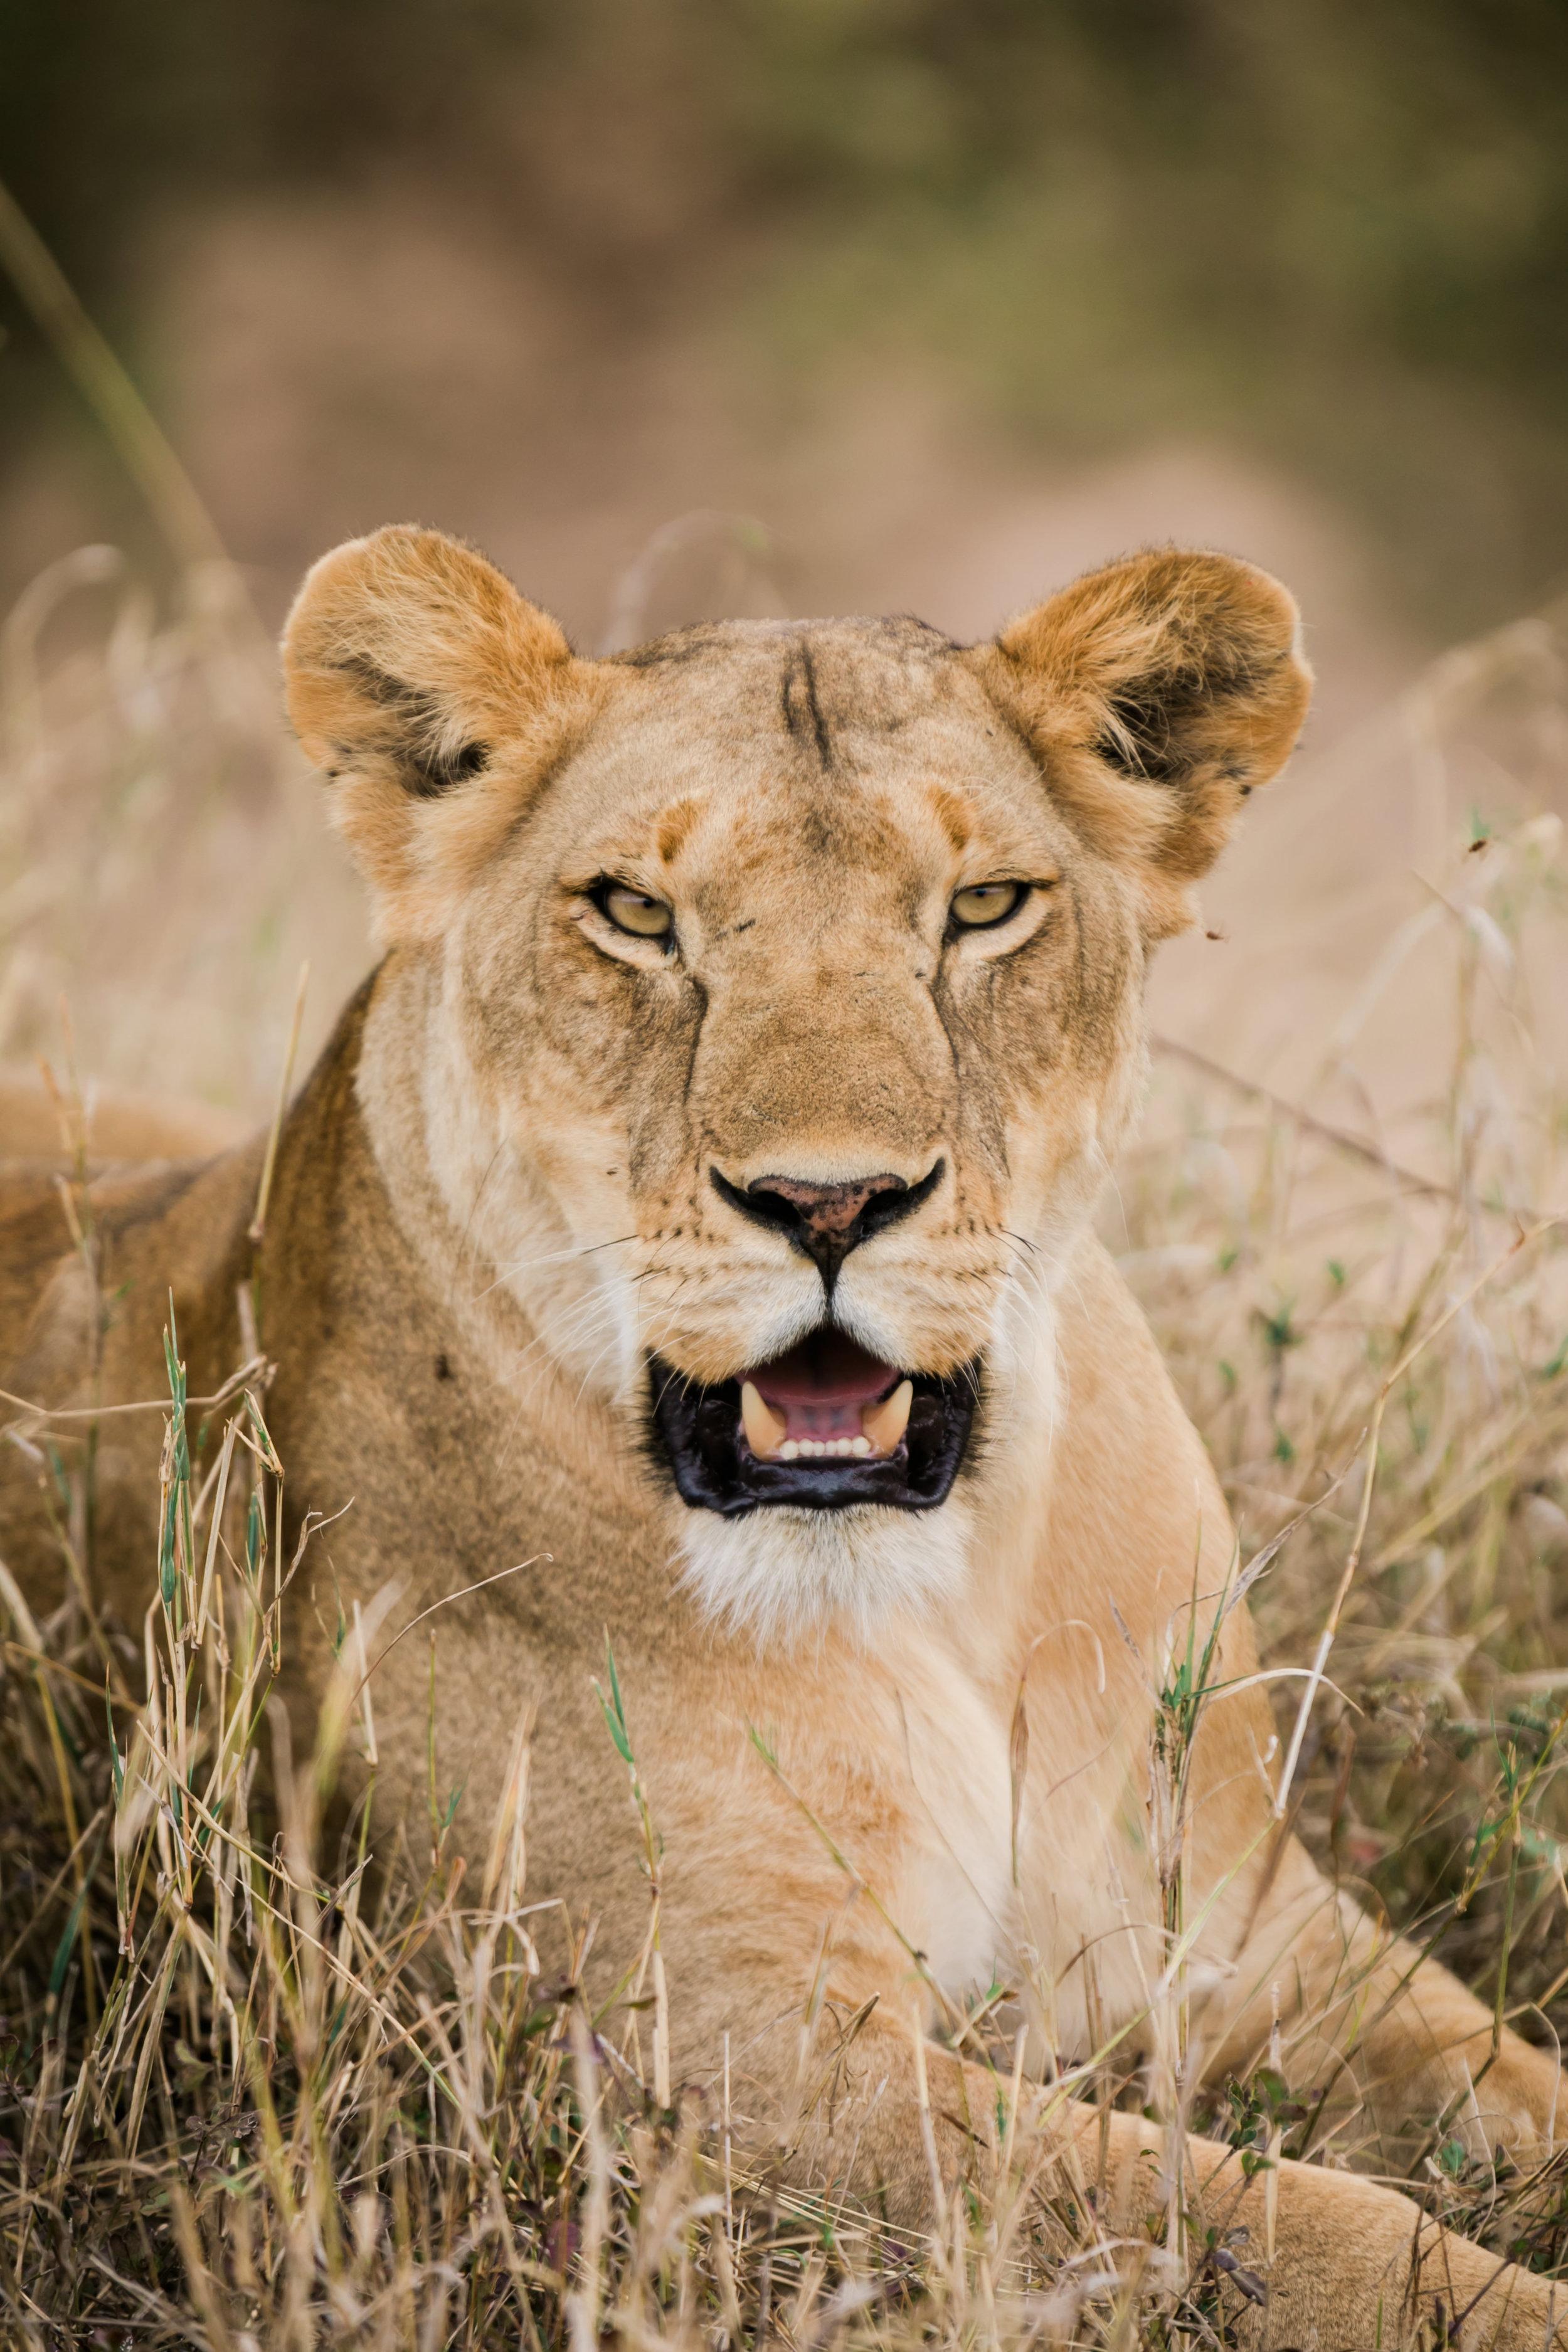 Female lion on Safari Kenya Ph. Valorie Darling